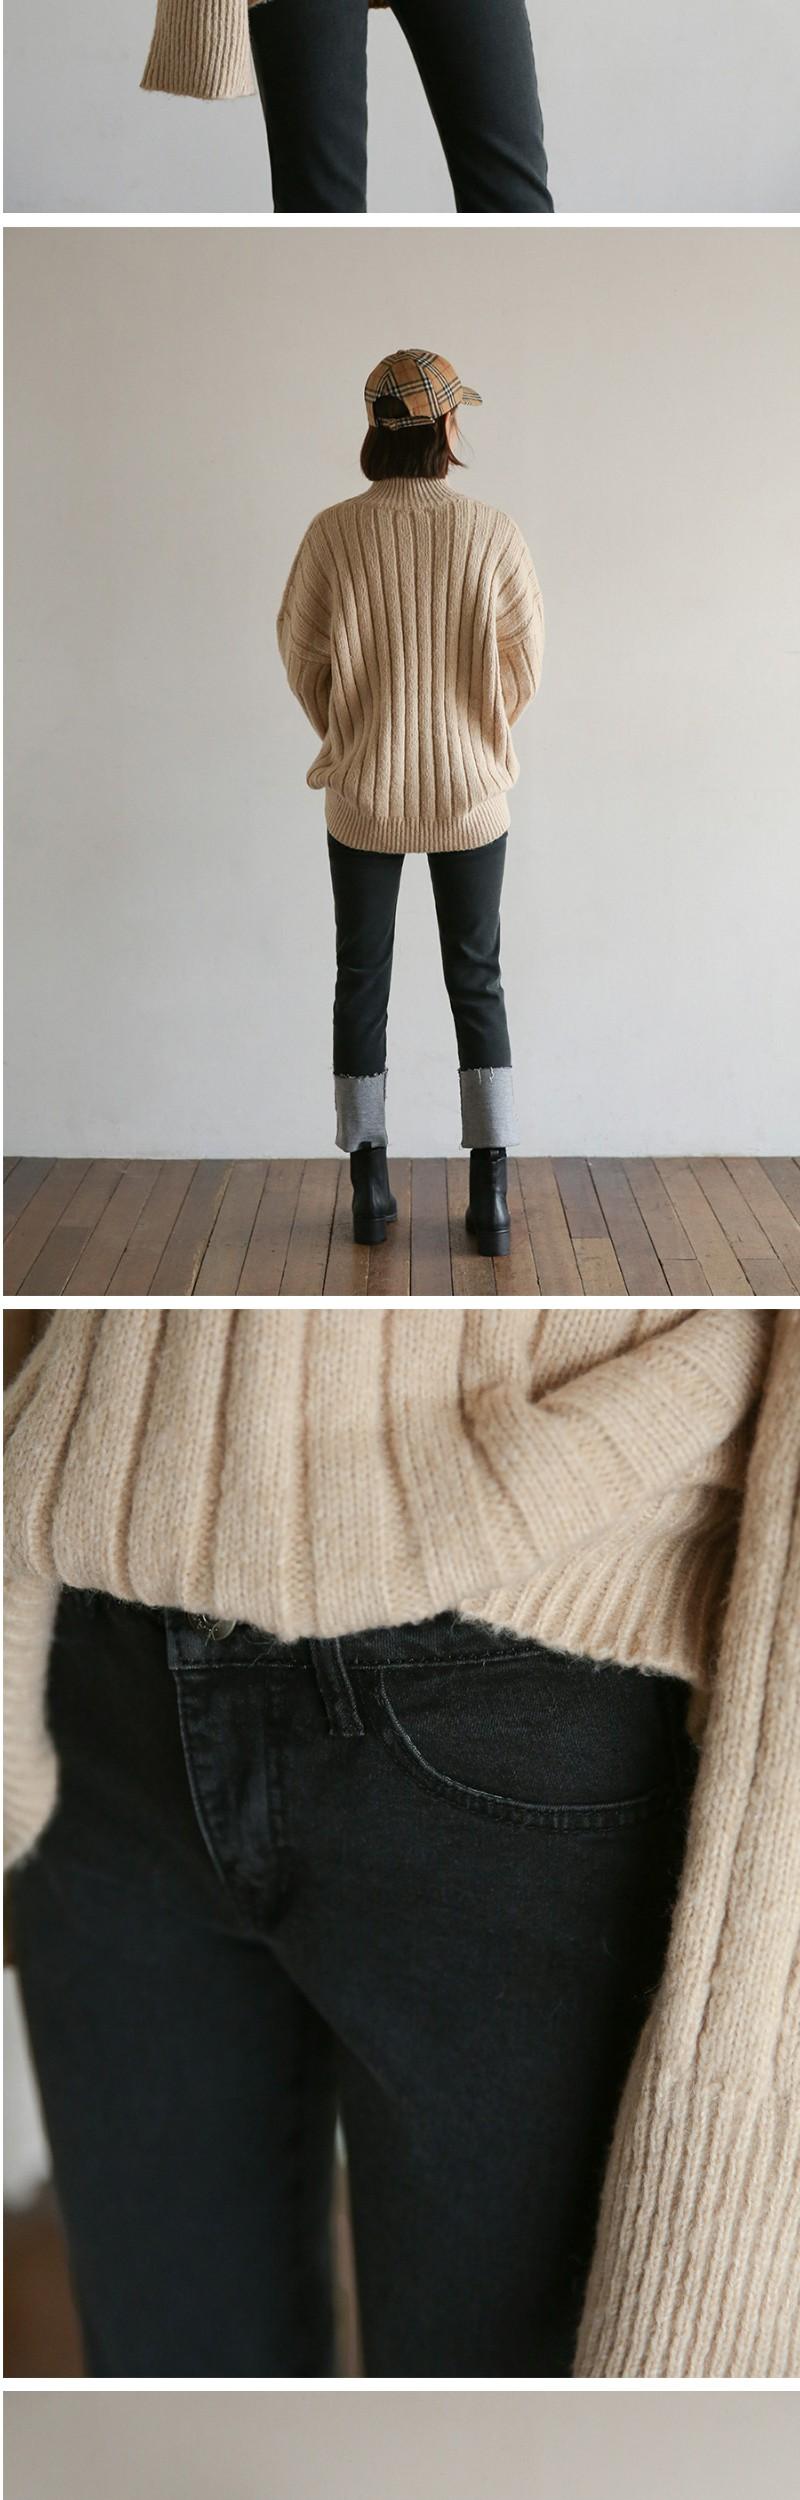 napping slim roll-up denim pants